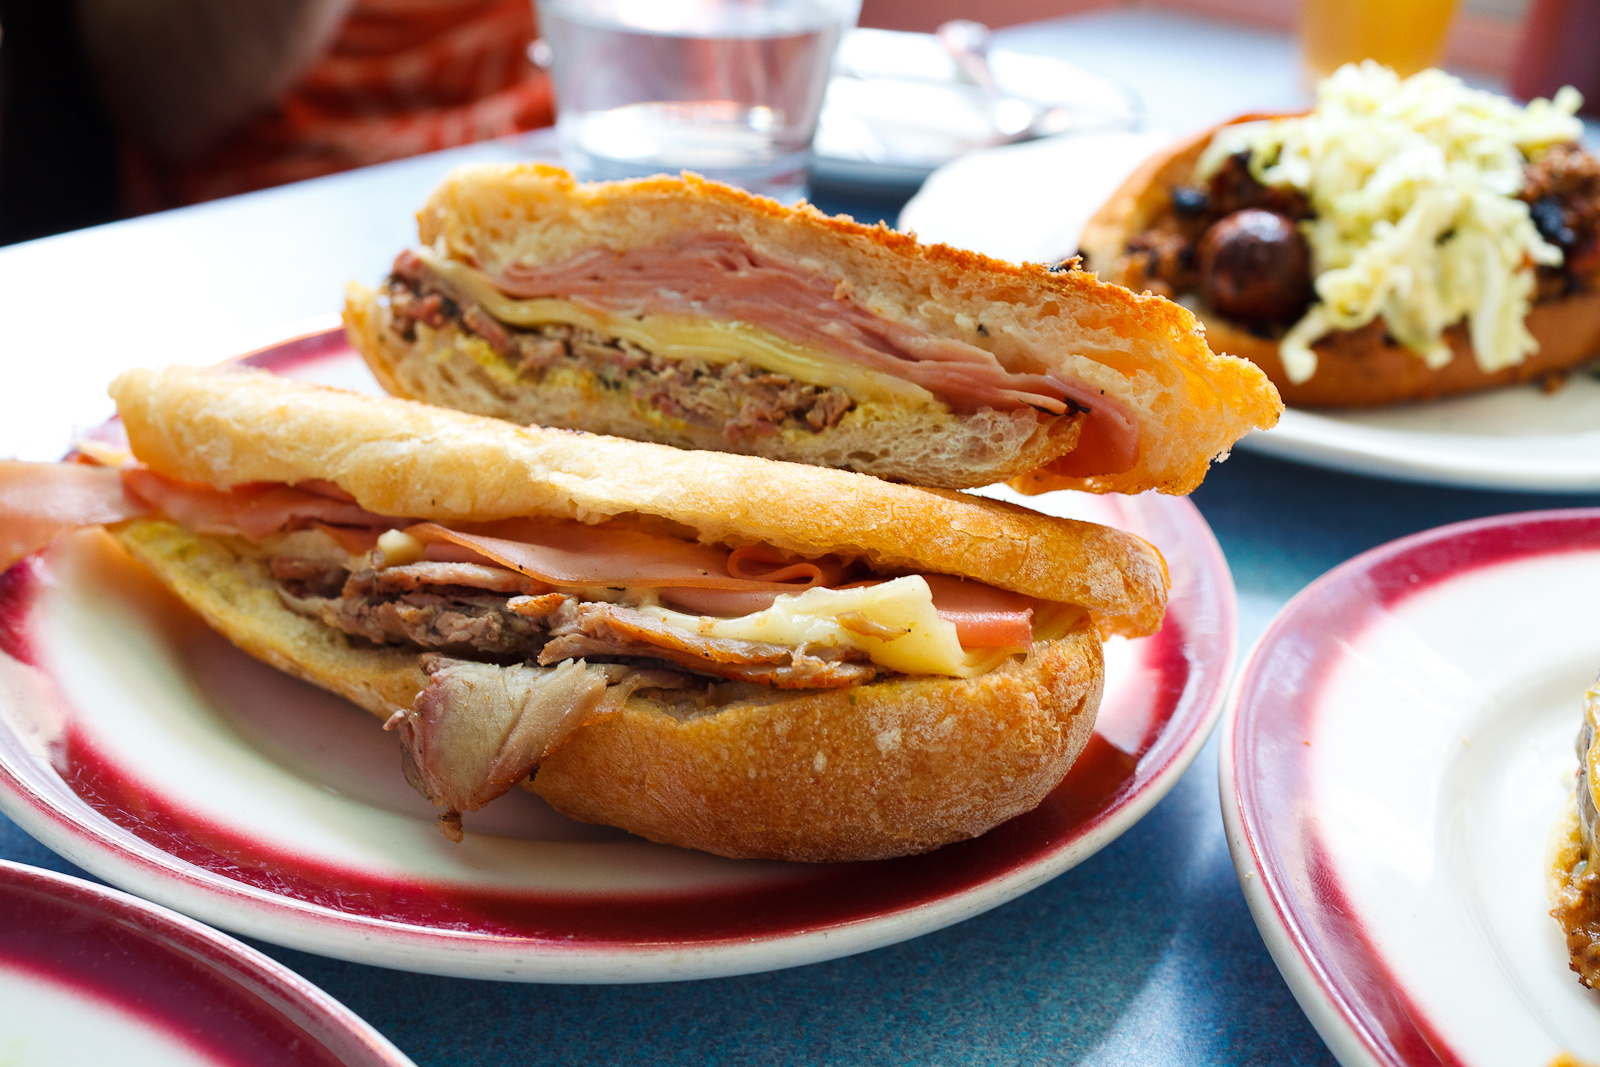 Cubano Sandwich, Roasted Pork, Pickles, Mortadella, Gruyere ($7)